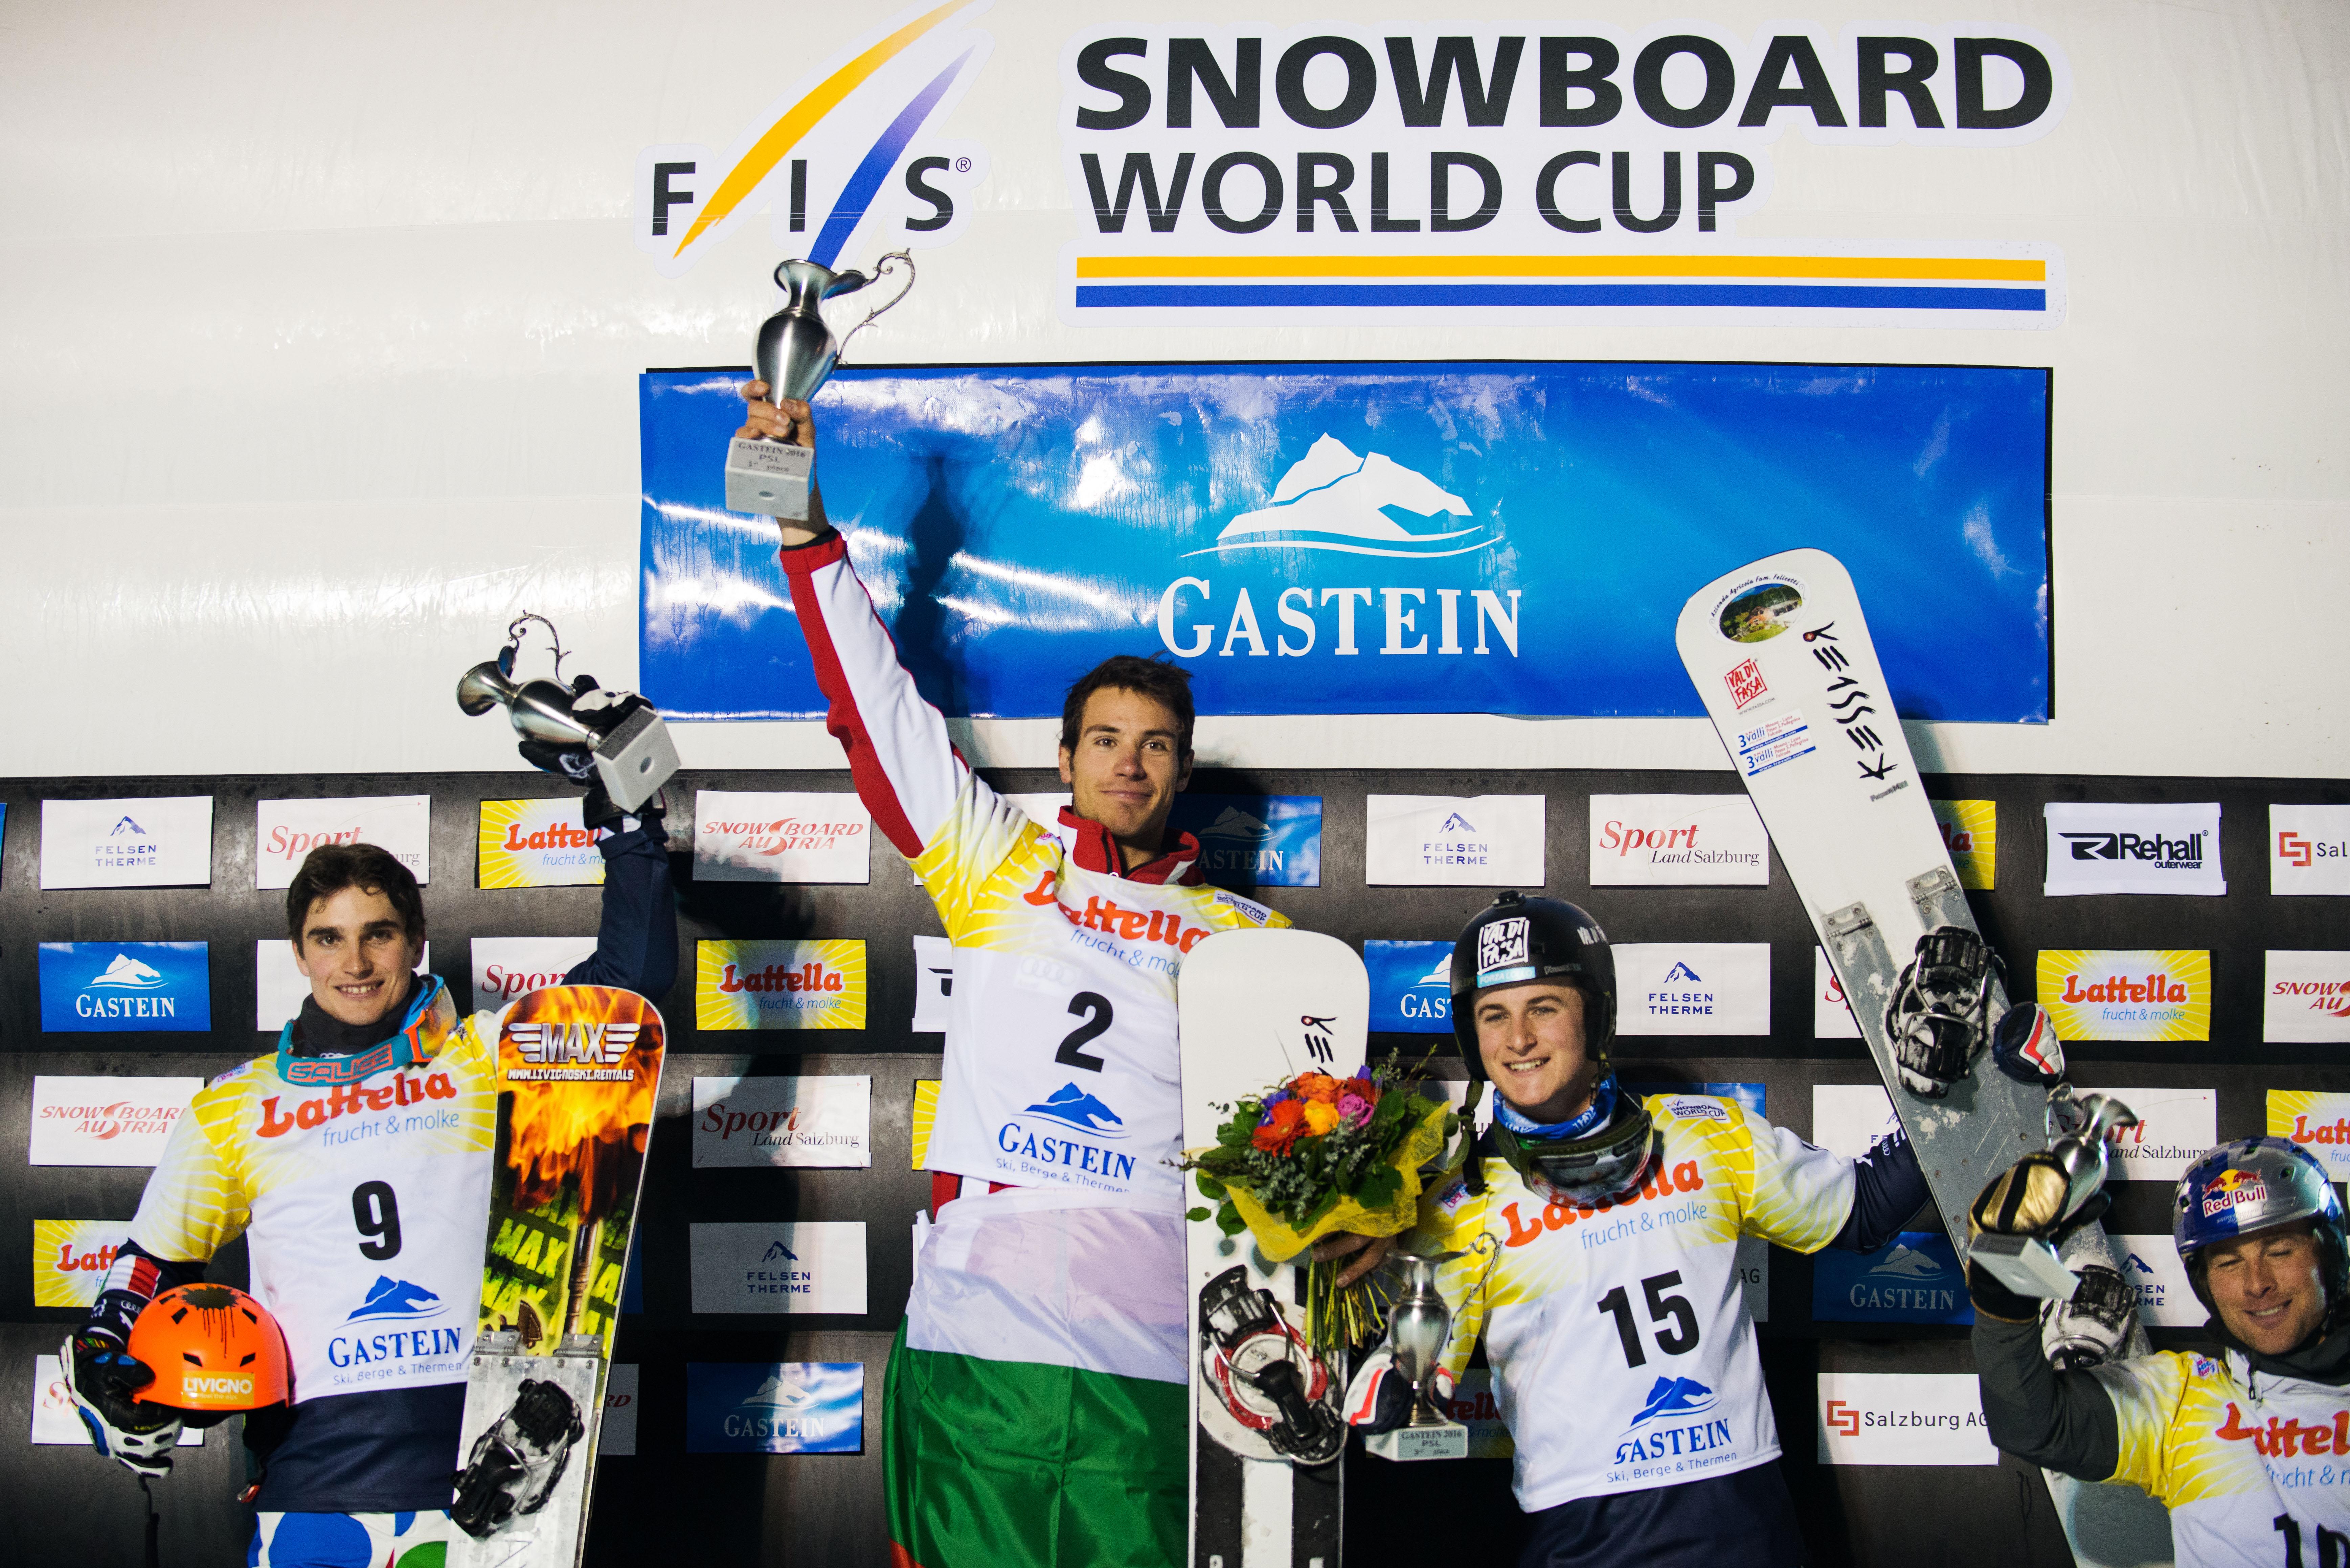 FIS Snowboard World Cup - Bad Gastein AUT - PSL - Men's podium with 2nd BORMOLINI Maurizio ITA 1st YANKOV Radoslav BUL, 3rd FELICETTI Mirko ITA and 4th KARL Benjamin AUT © Miha Matavz